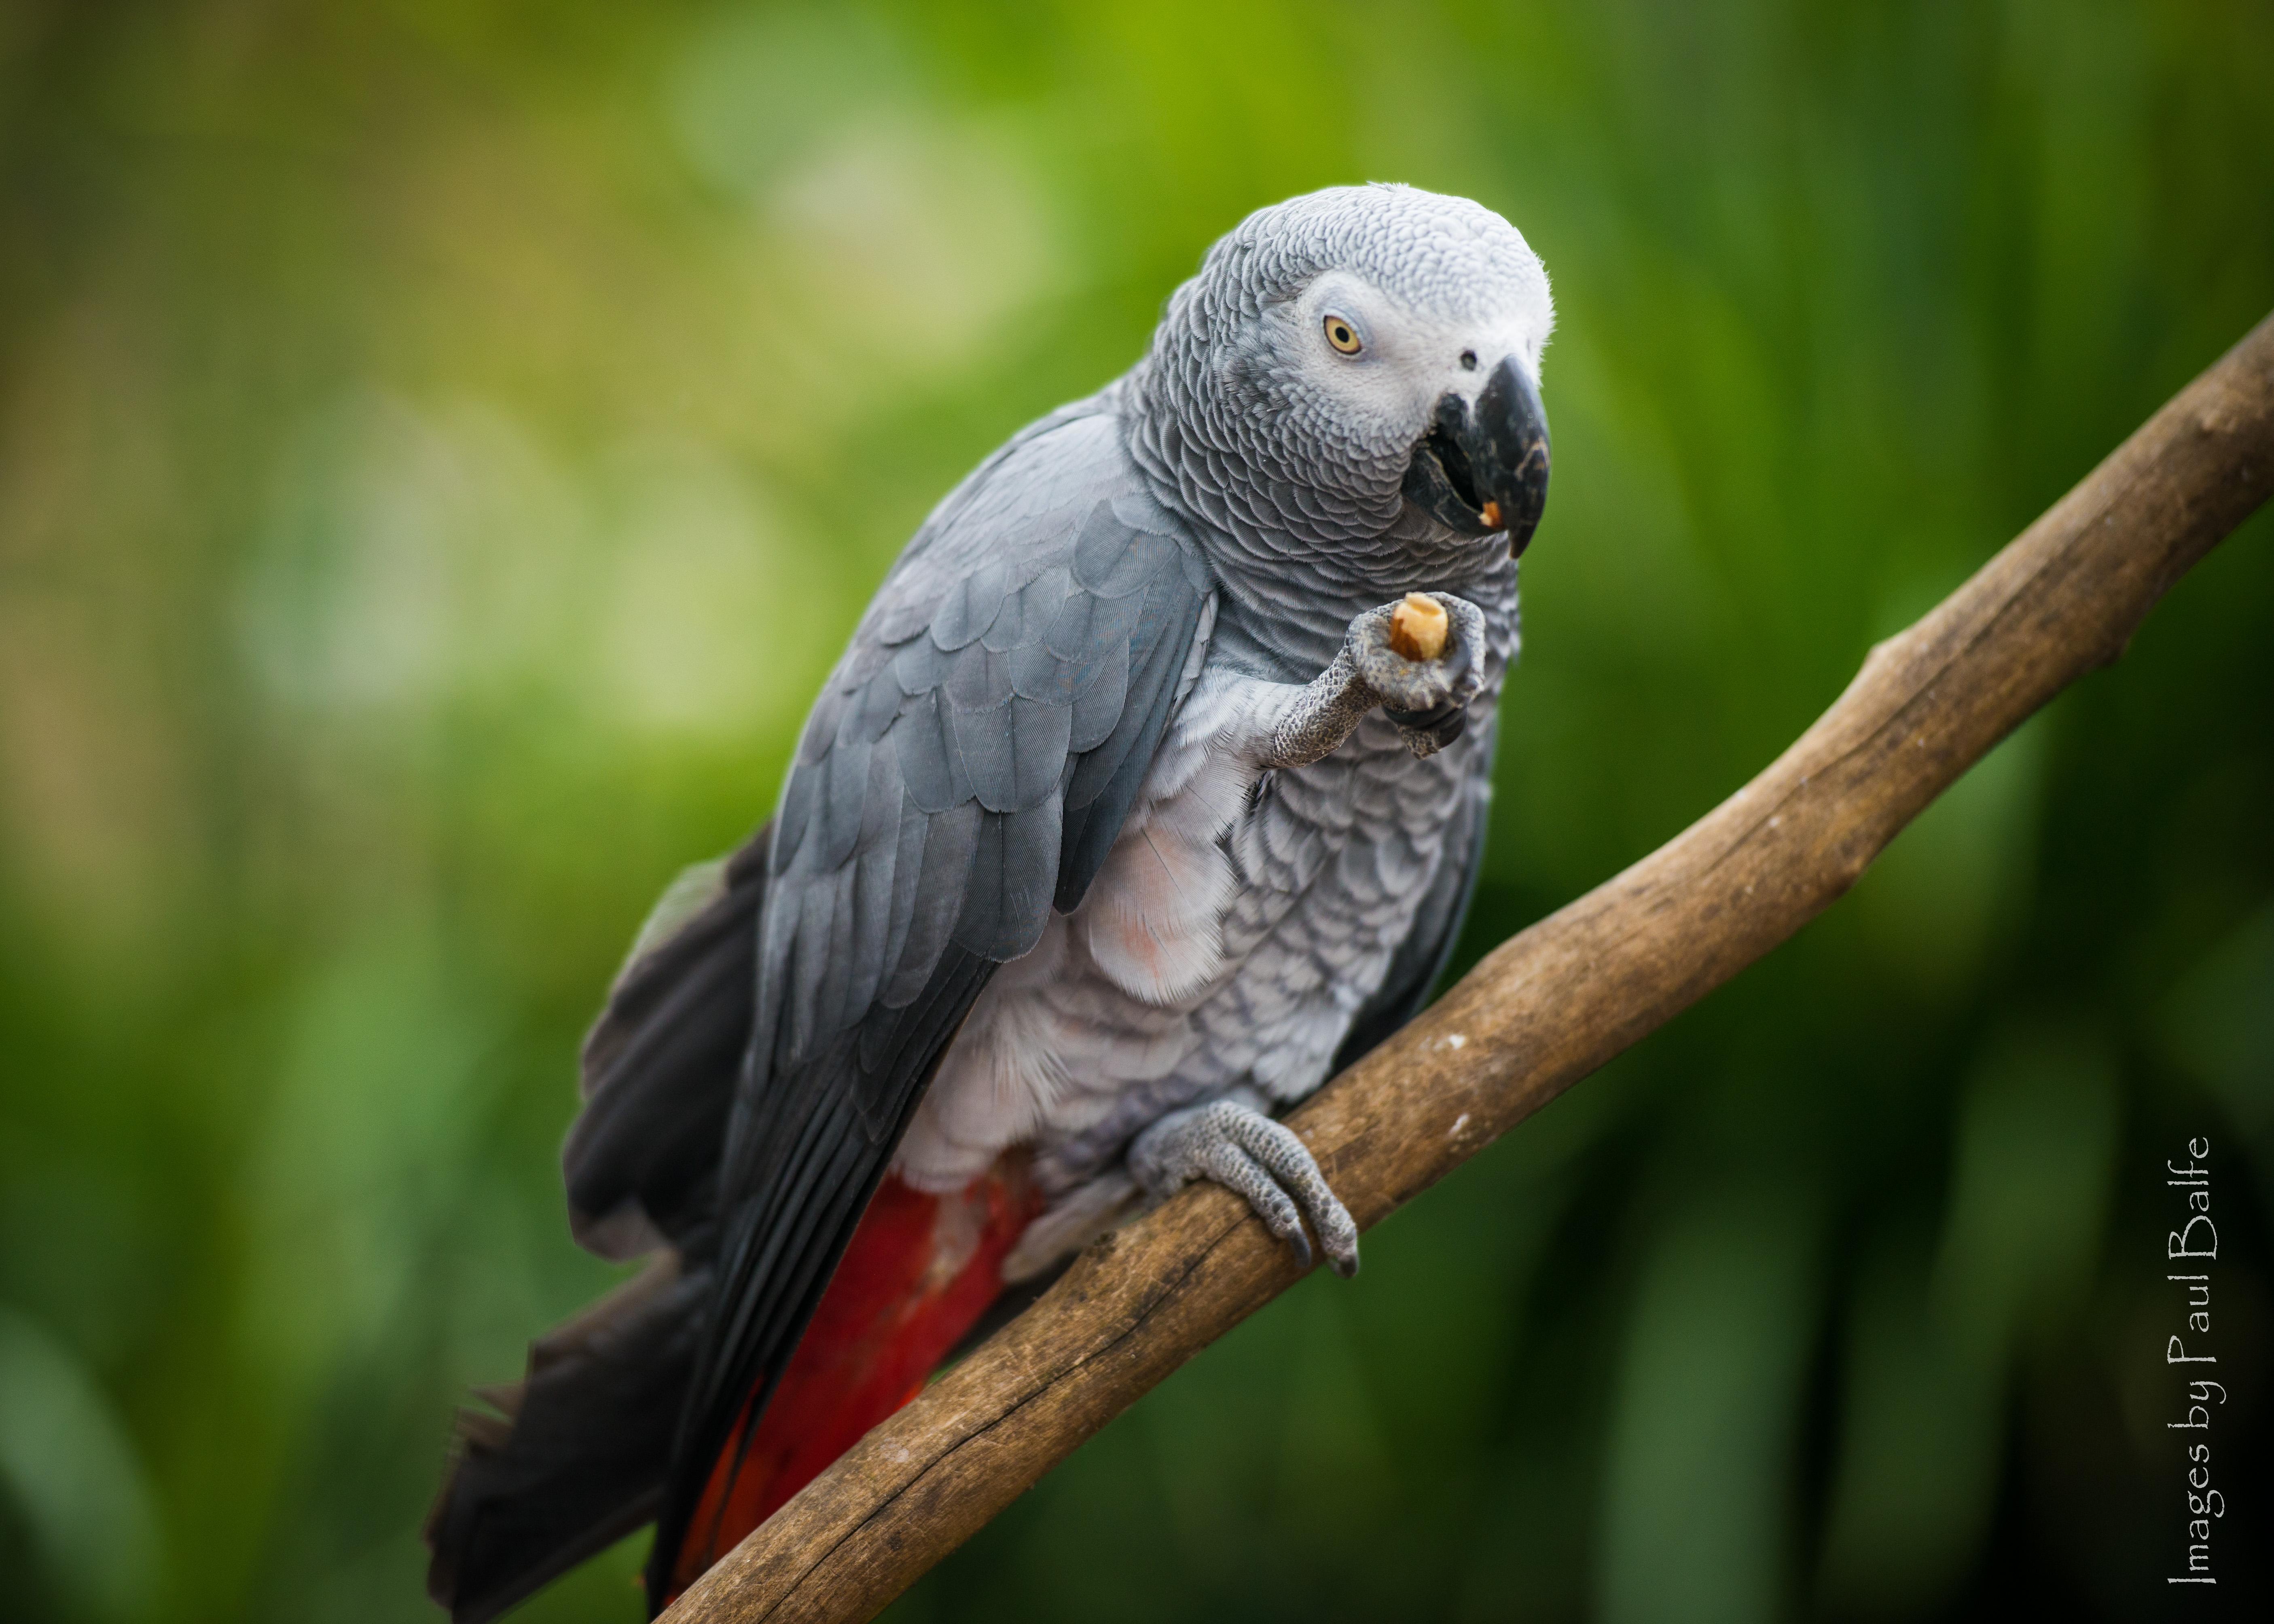 Wild Bird Conservation Act